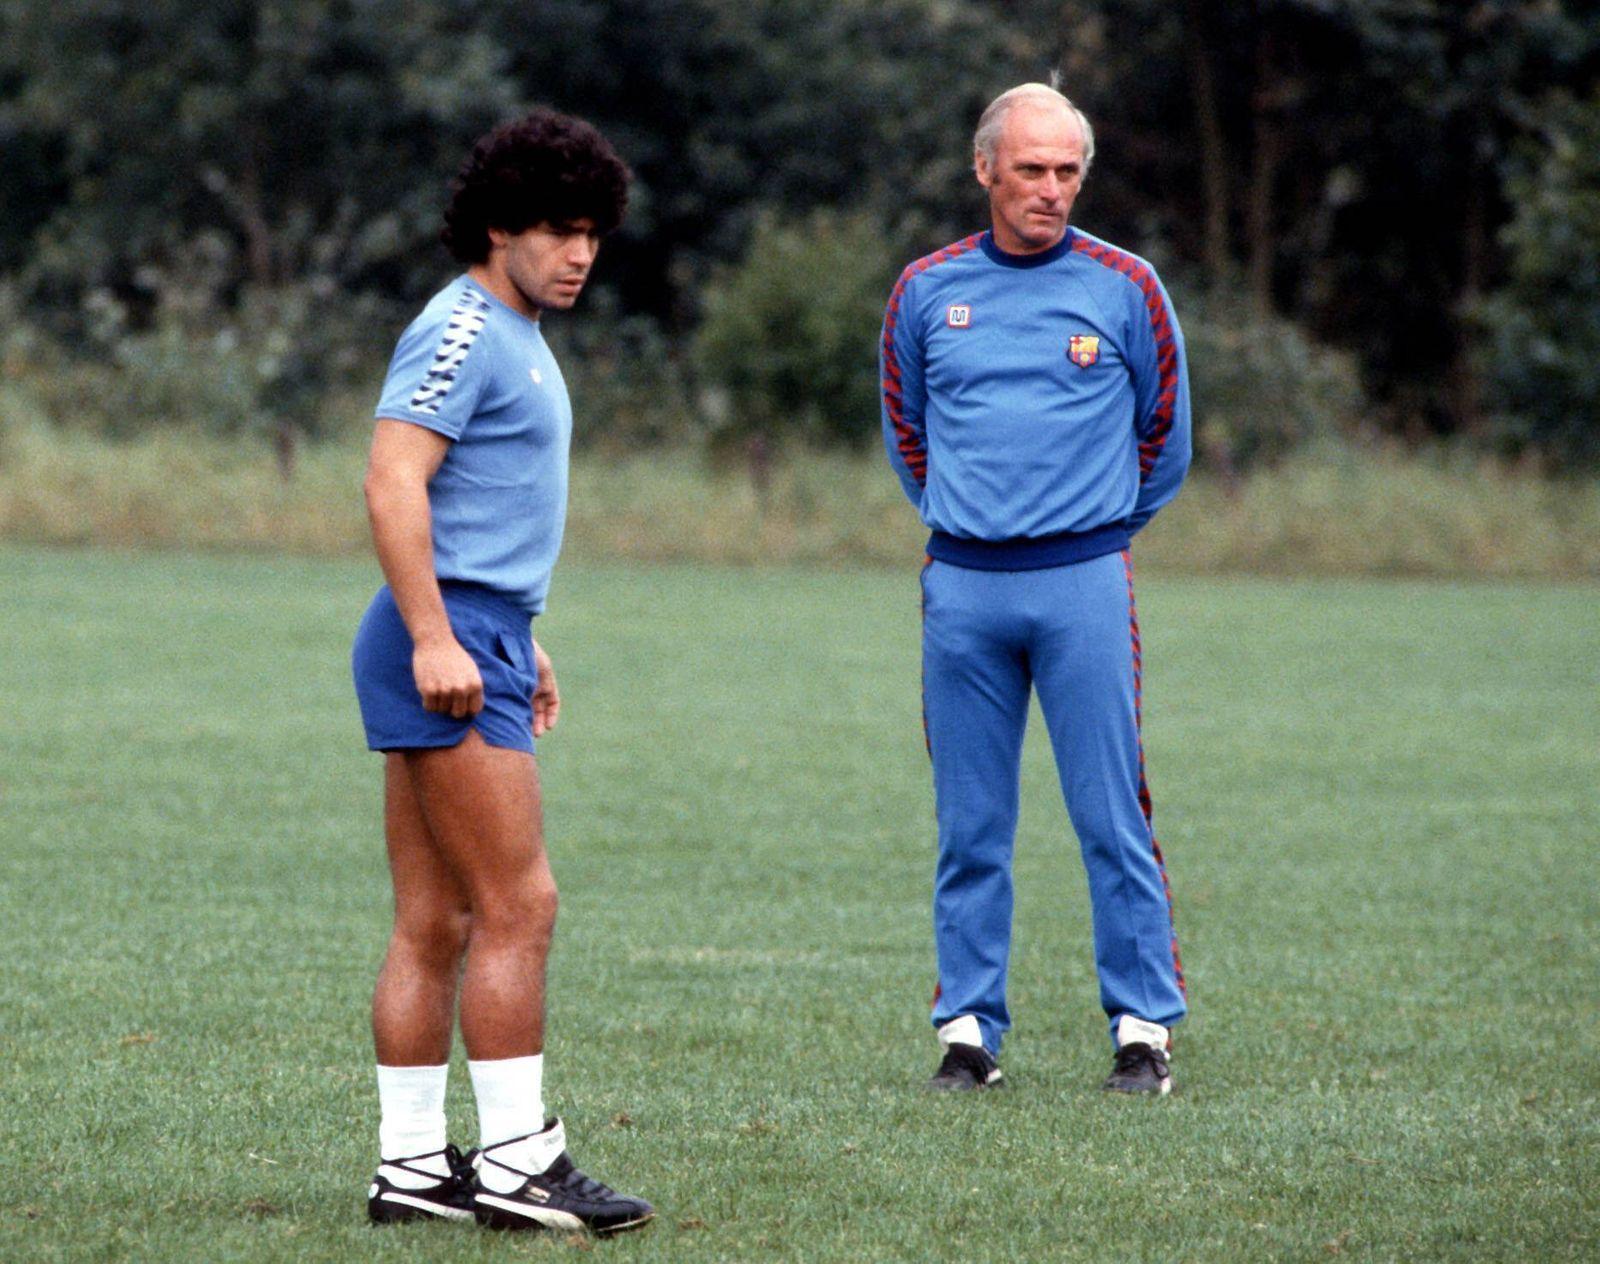 Diego Armando Maradona mit Trainer Udo Lattek (beide FC Barcelona)